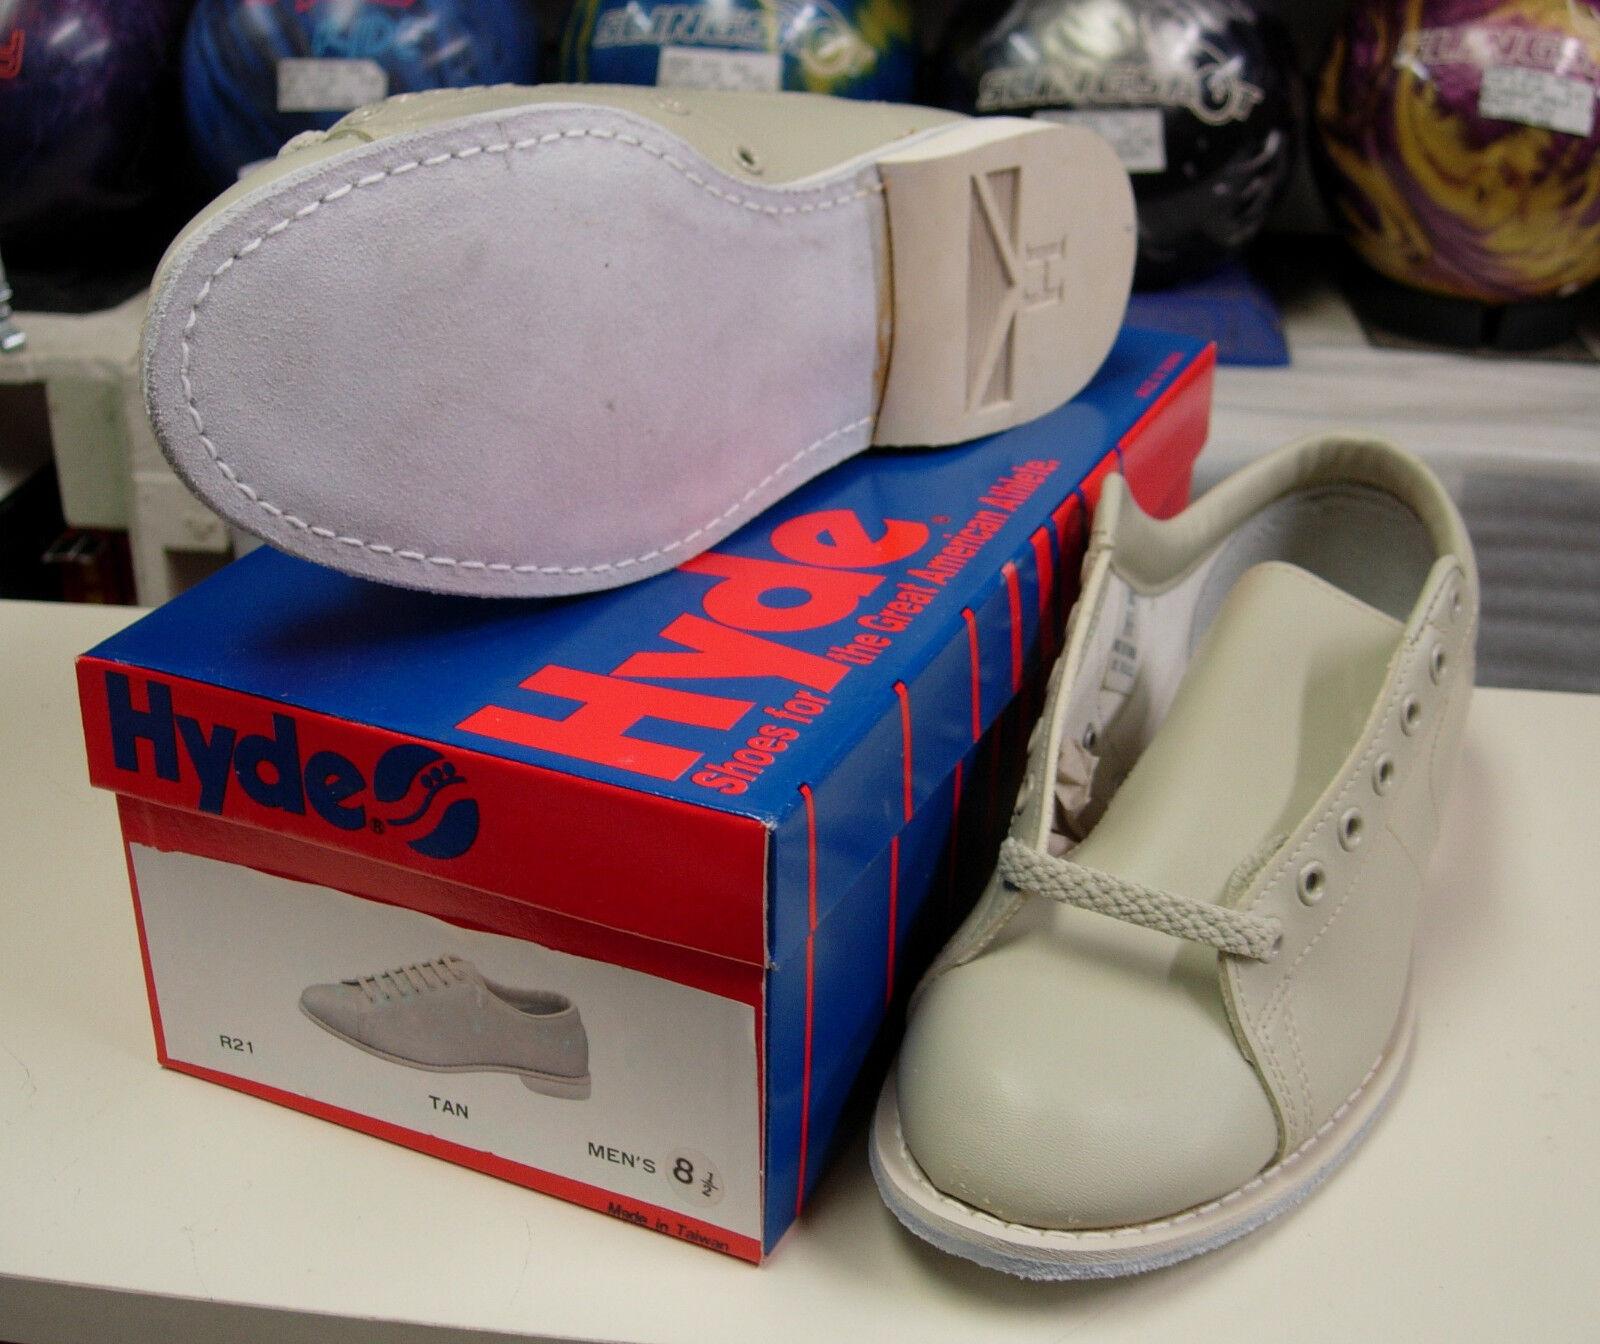 8.5 Hyde R21 Traditional Vinyl Bowling Shoe Men Size 8.5m Rh/lh